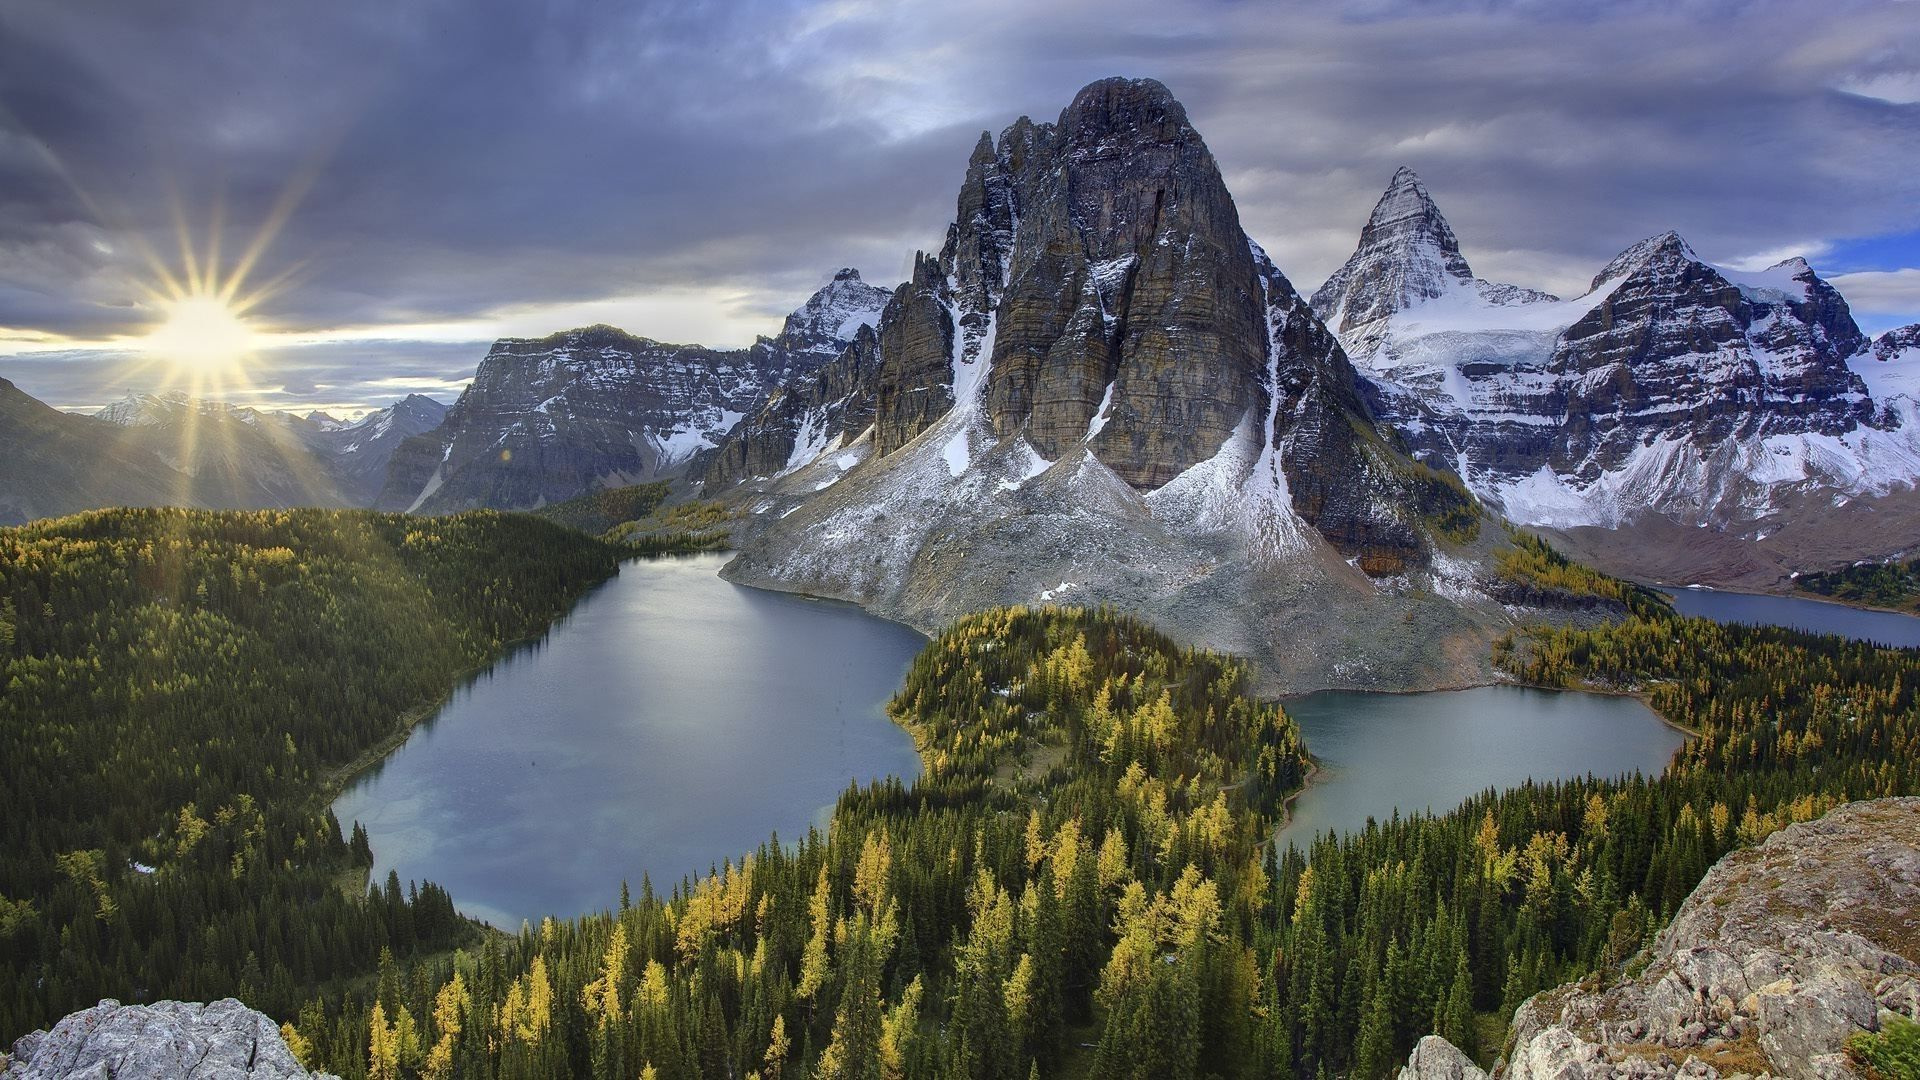 Rocky Mountain 1080p background